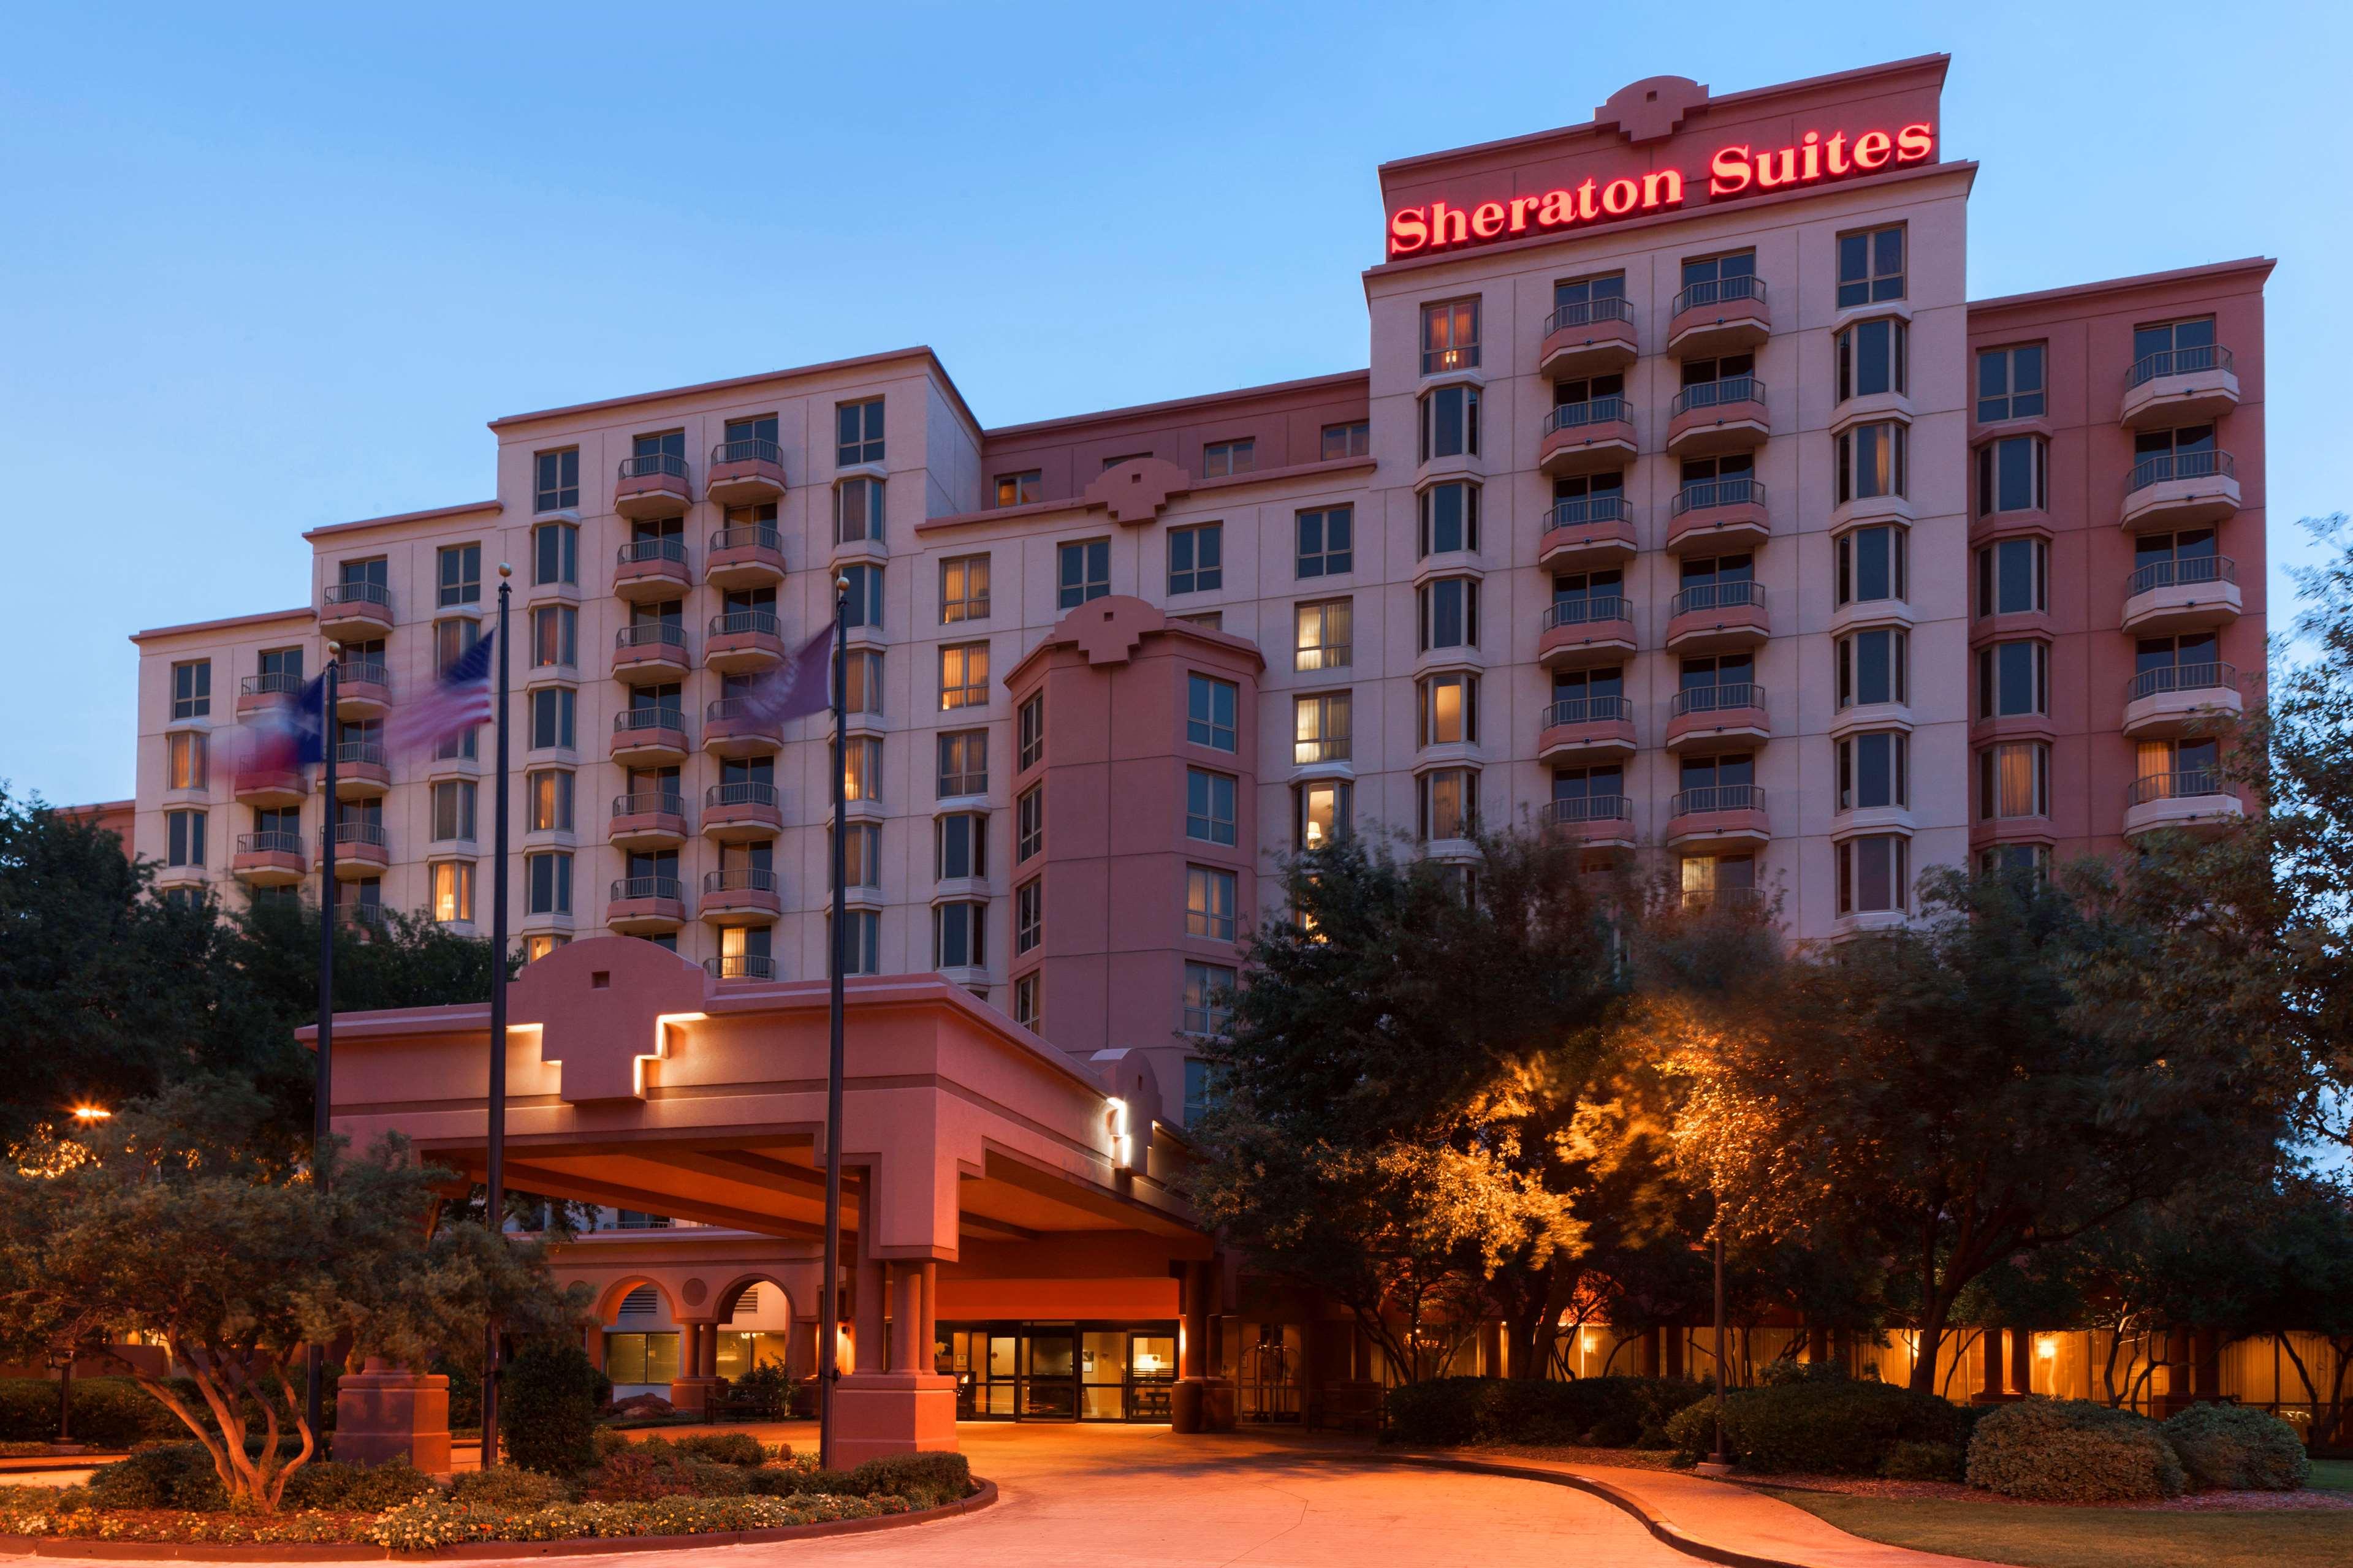 Sheraton Suites Market Center Dallas image 1